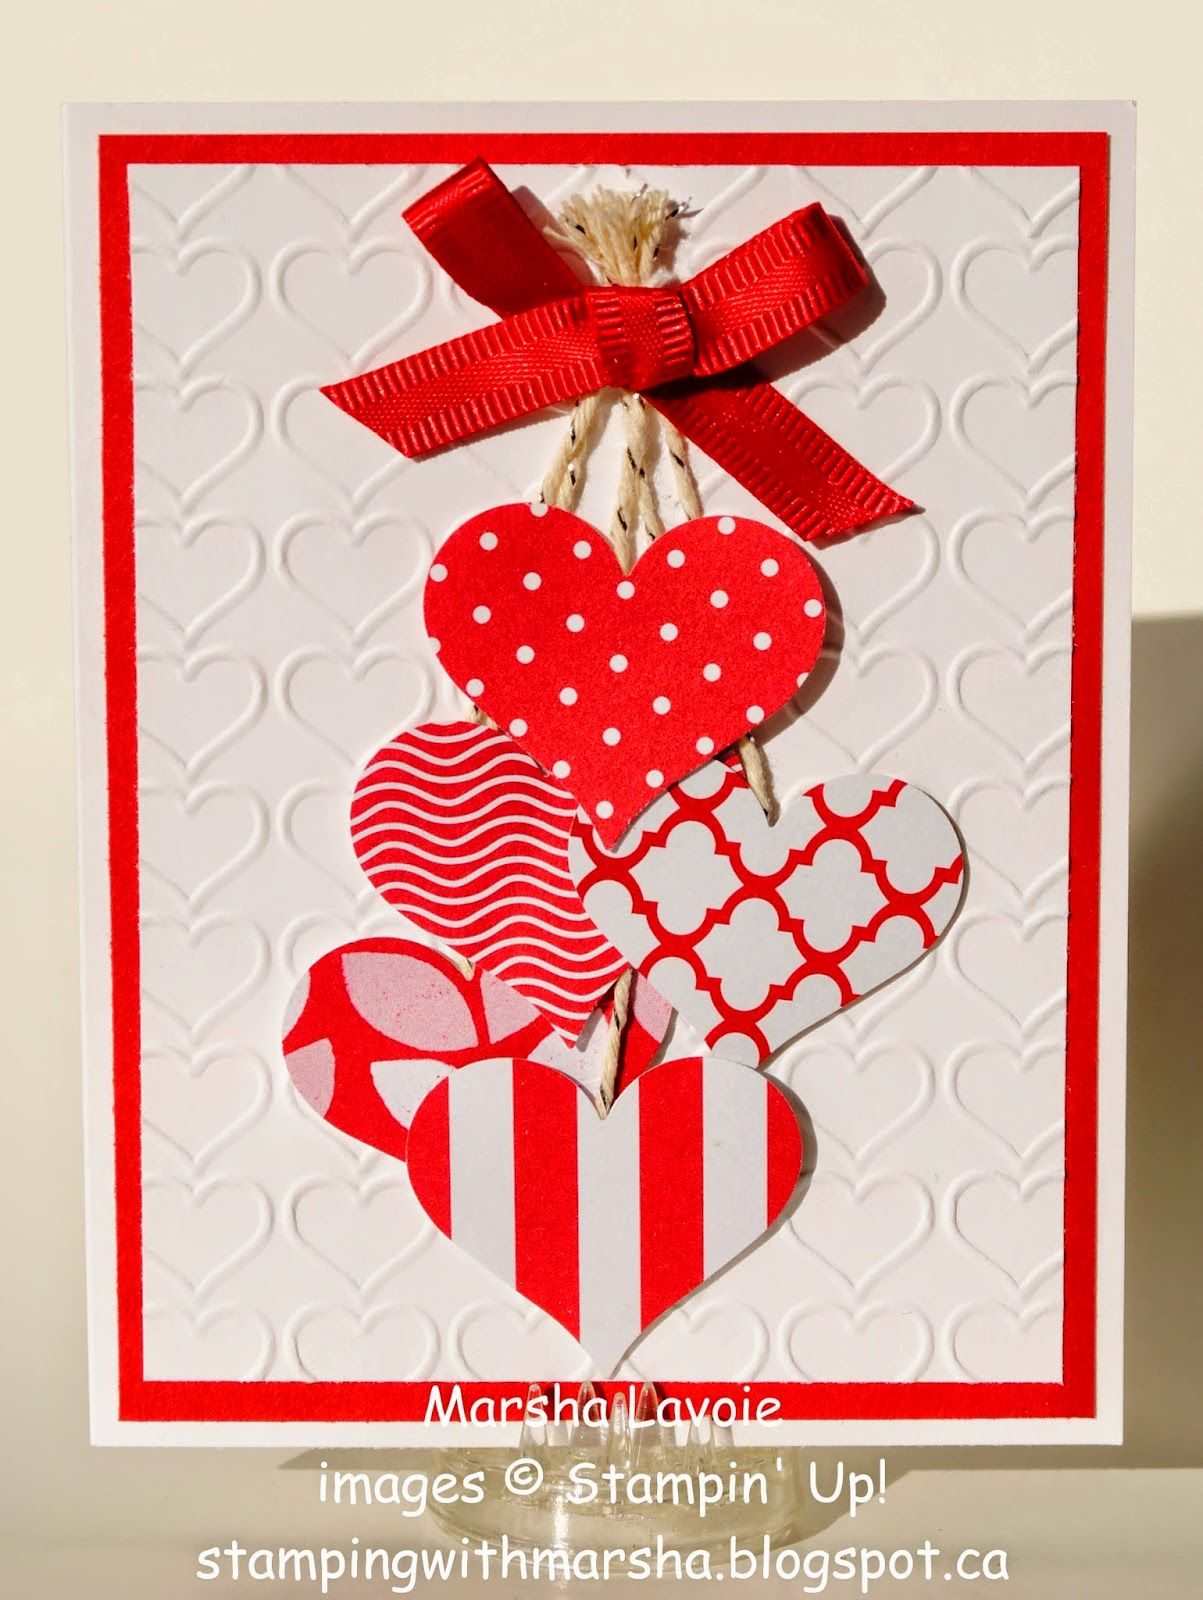 Valentines day card cards valentines pinterest valentine valentines day card m4hsunfo